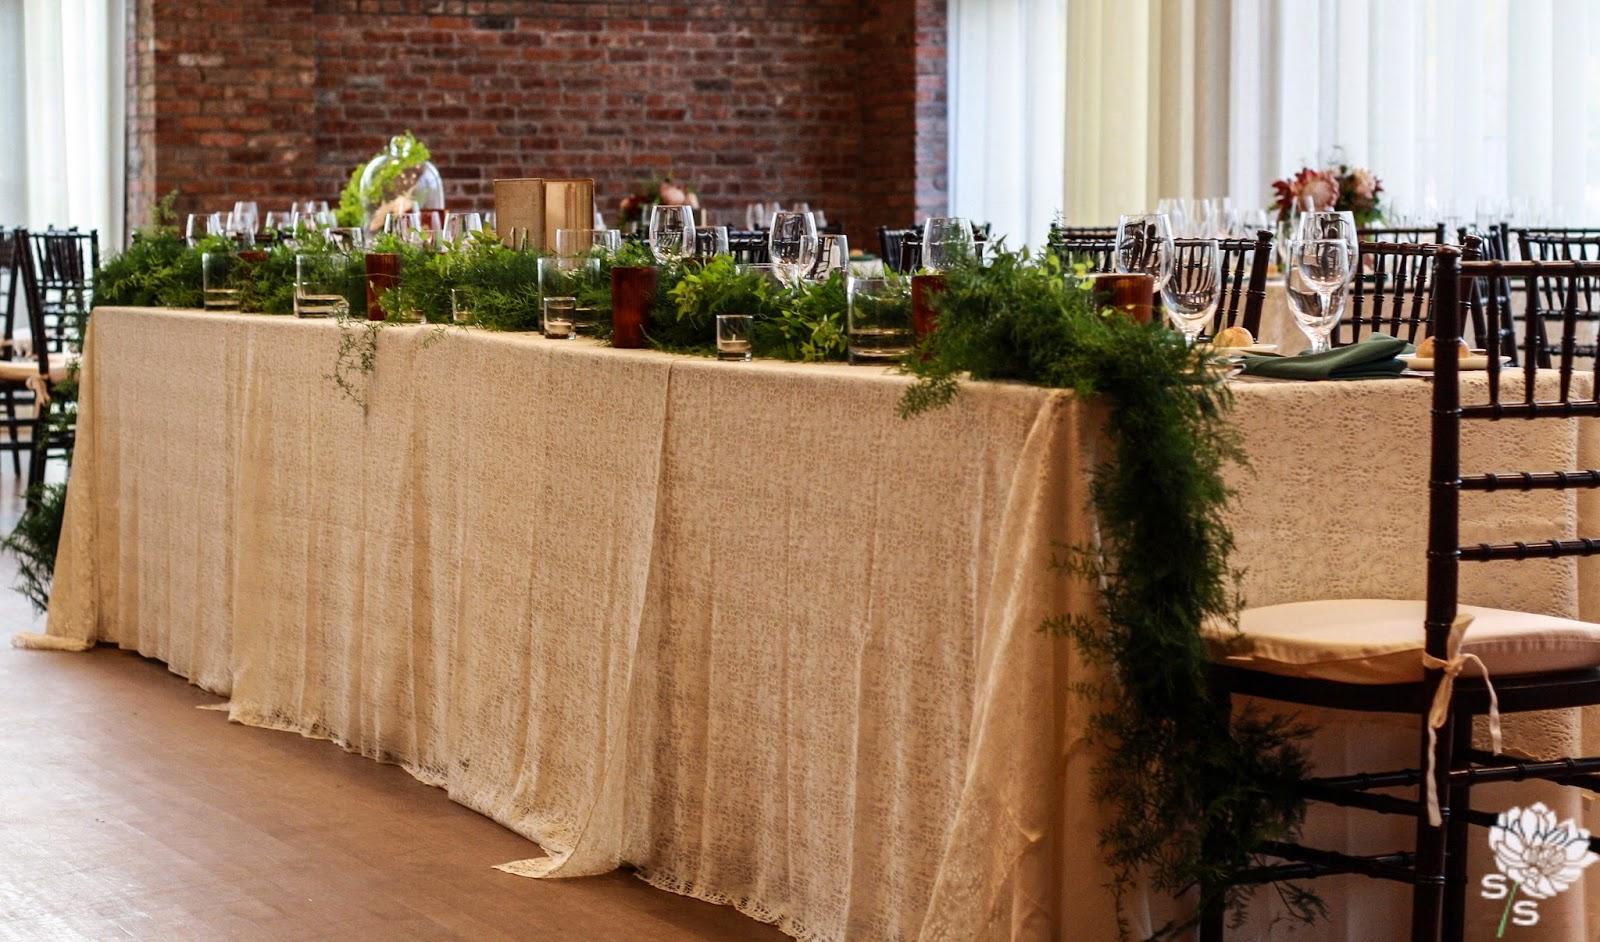 The Roundhouse Wedding - Beacon, NY - Hudson Valley Wedding - Head Table Garland - Wedding Flowers - Splendid Stems Floral Designs